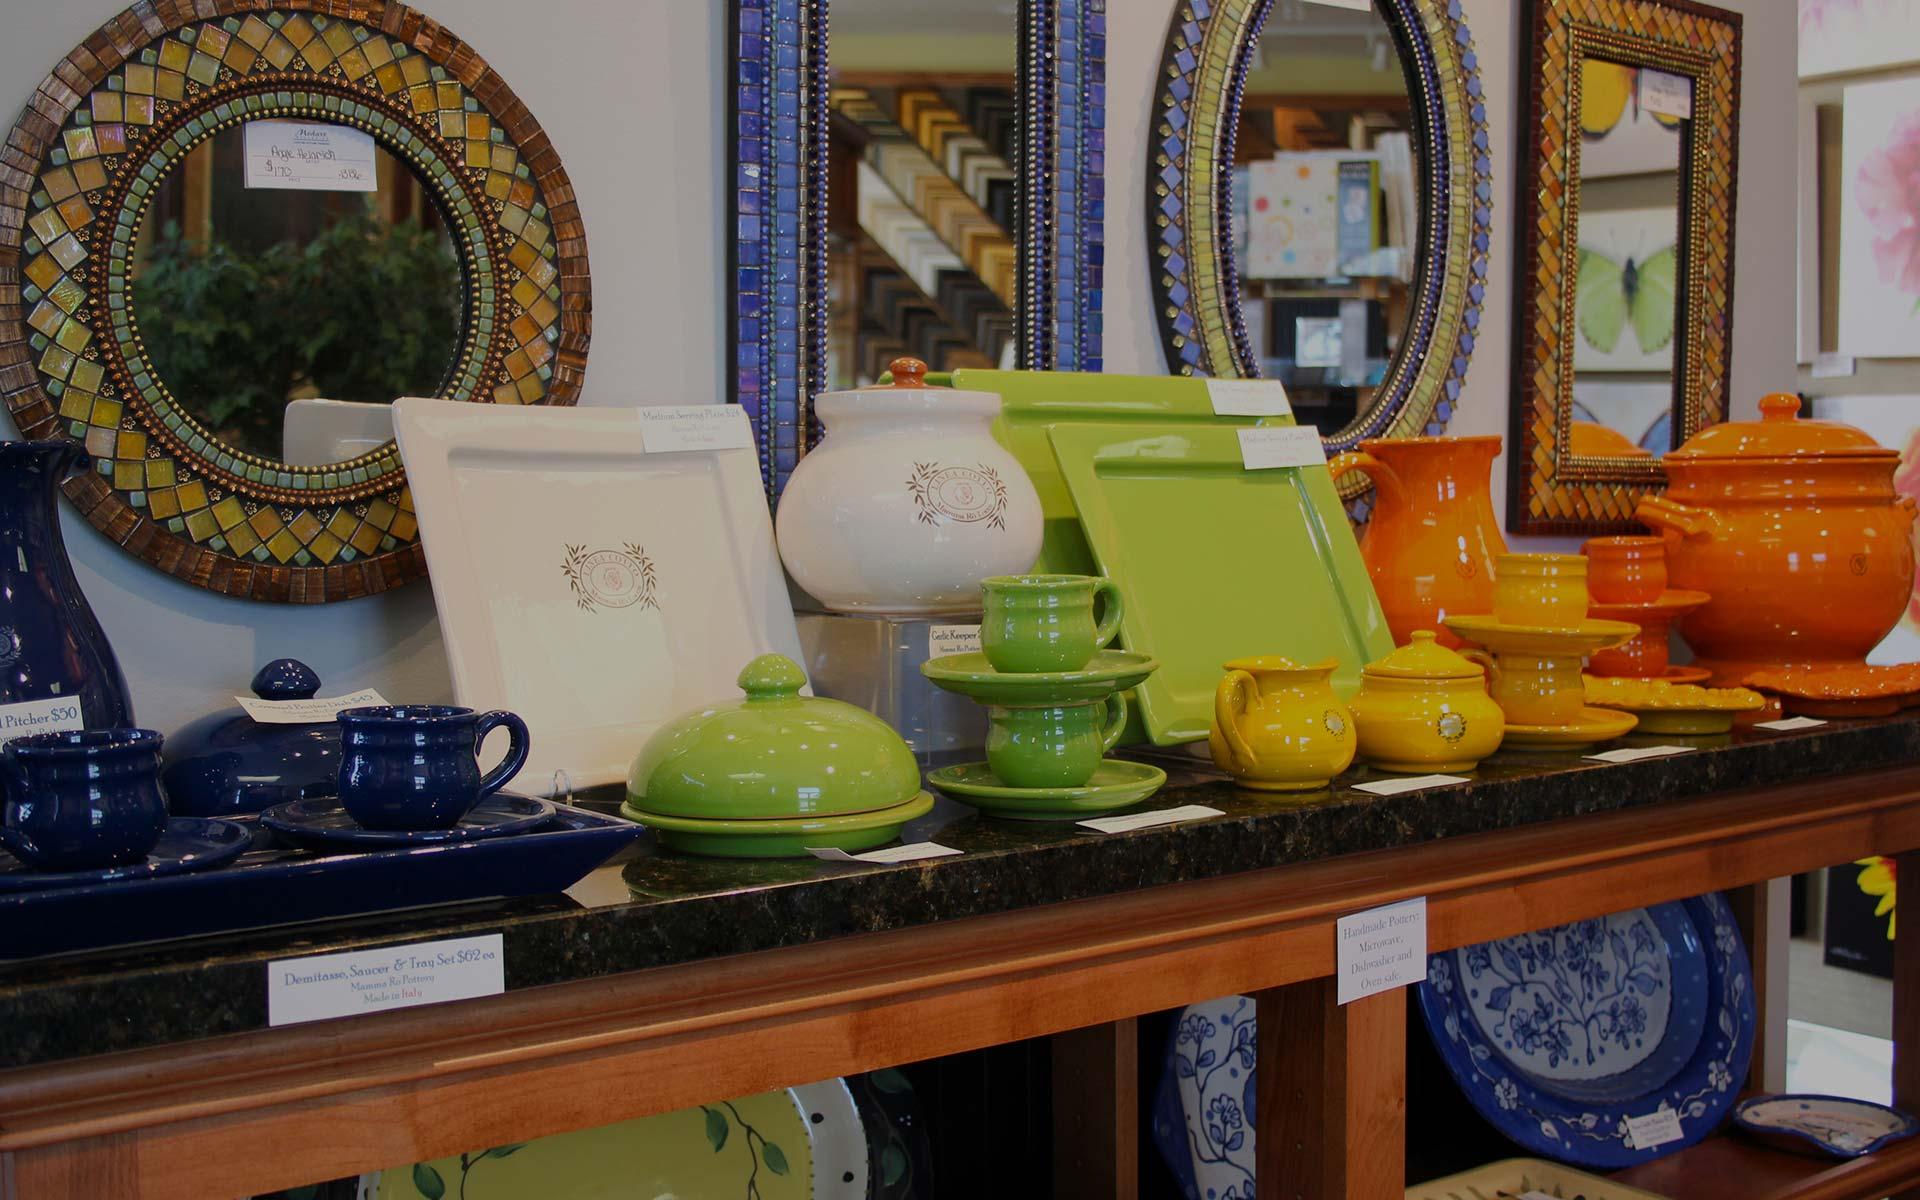 Ceramics, Pottery & Gifts